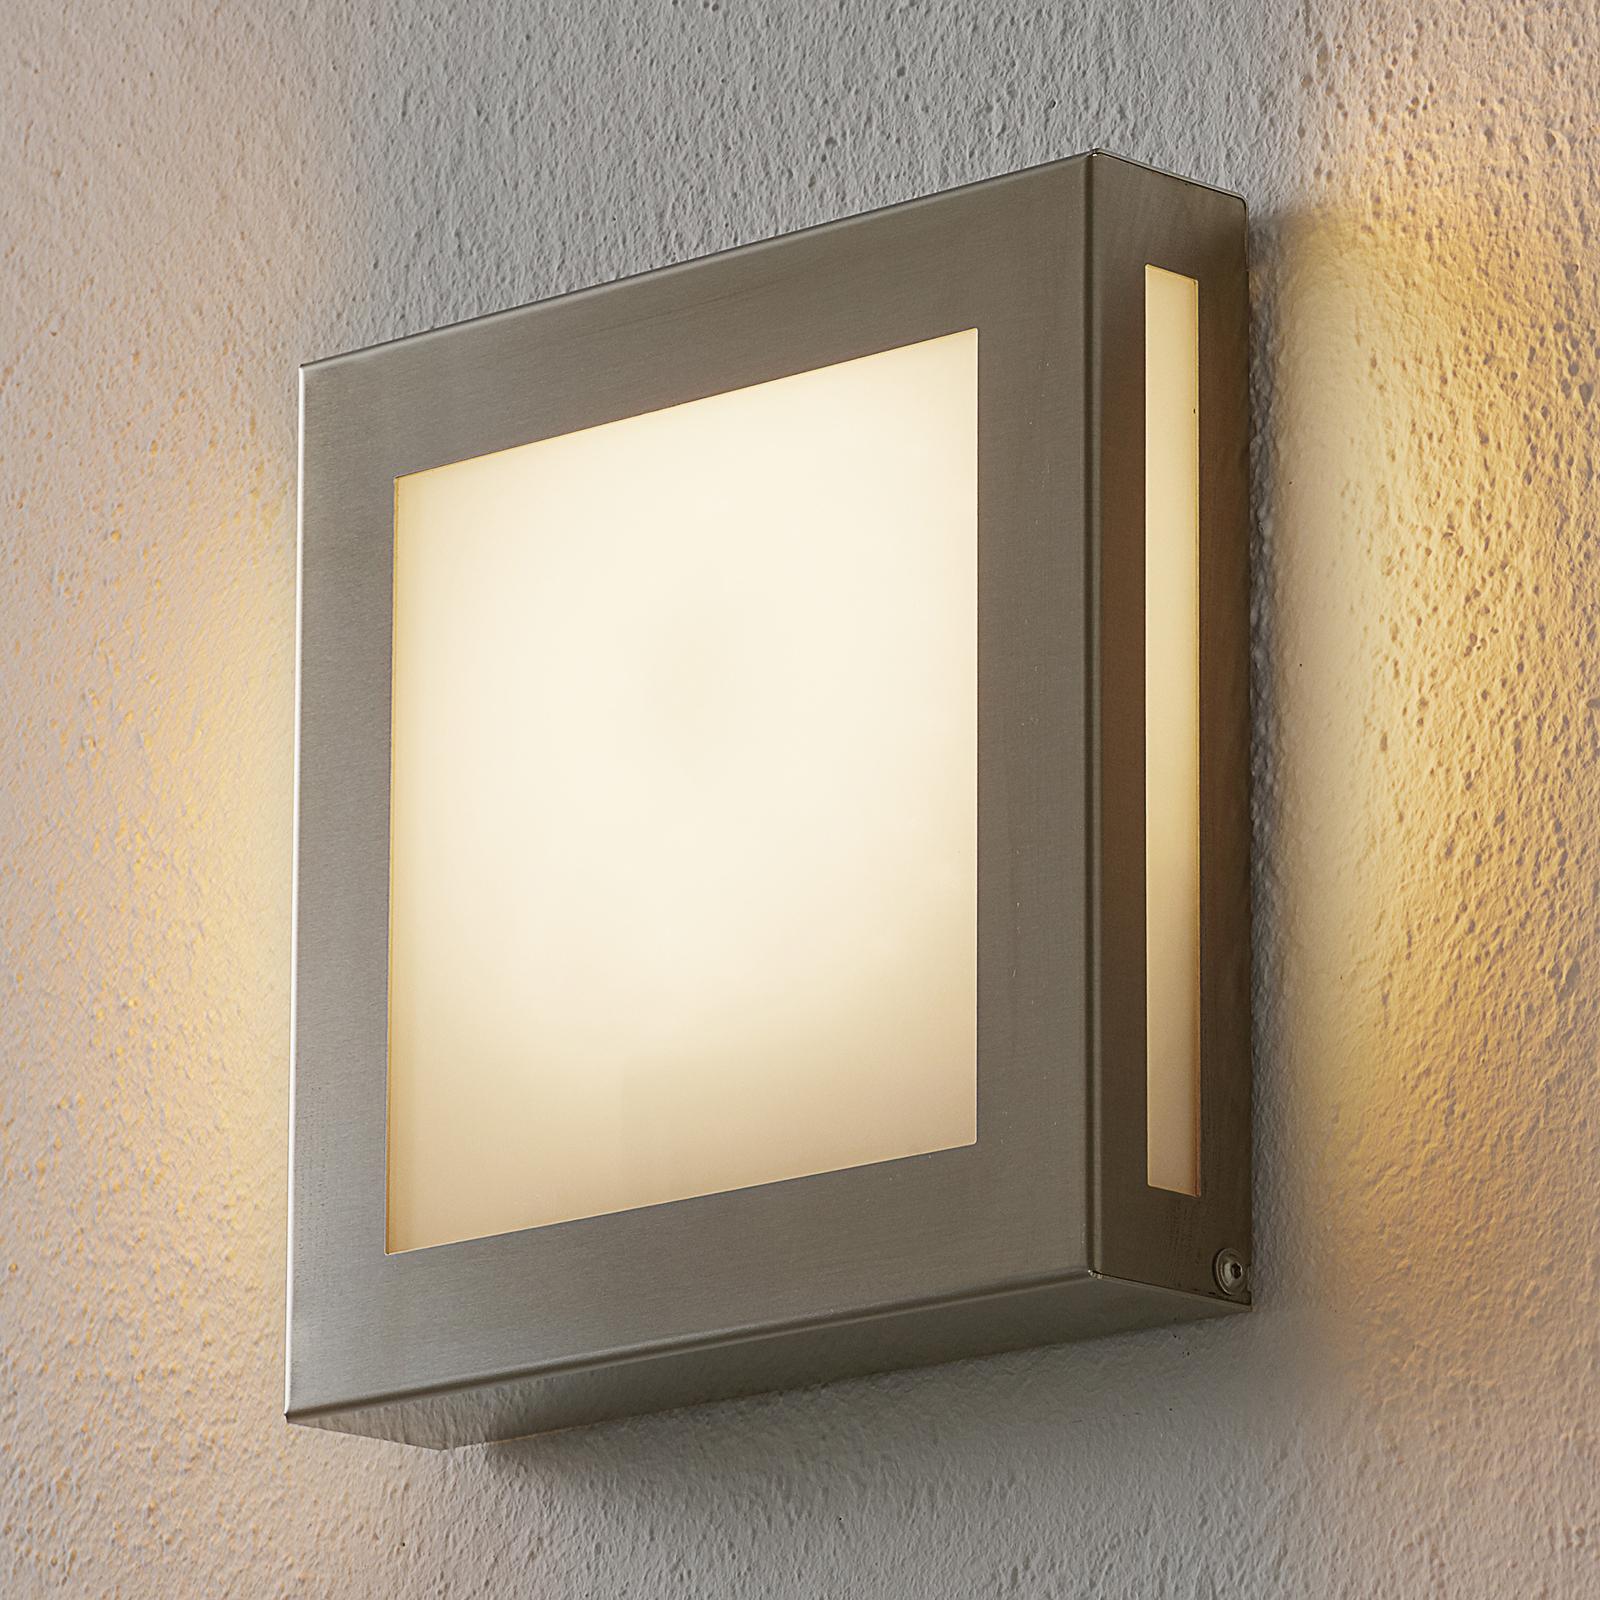 Sensor-LED-utelampe Aqua Legendo Mini, rustfr.stål